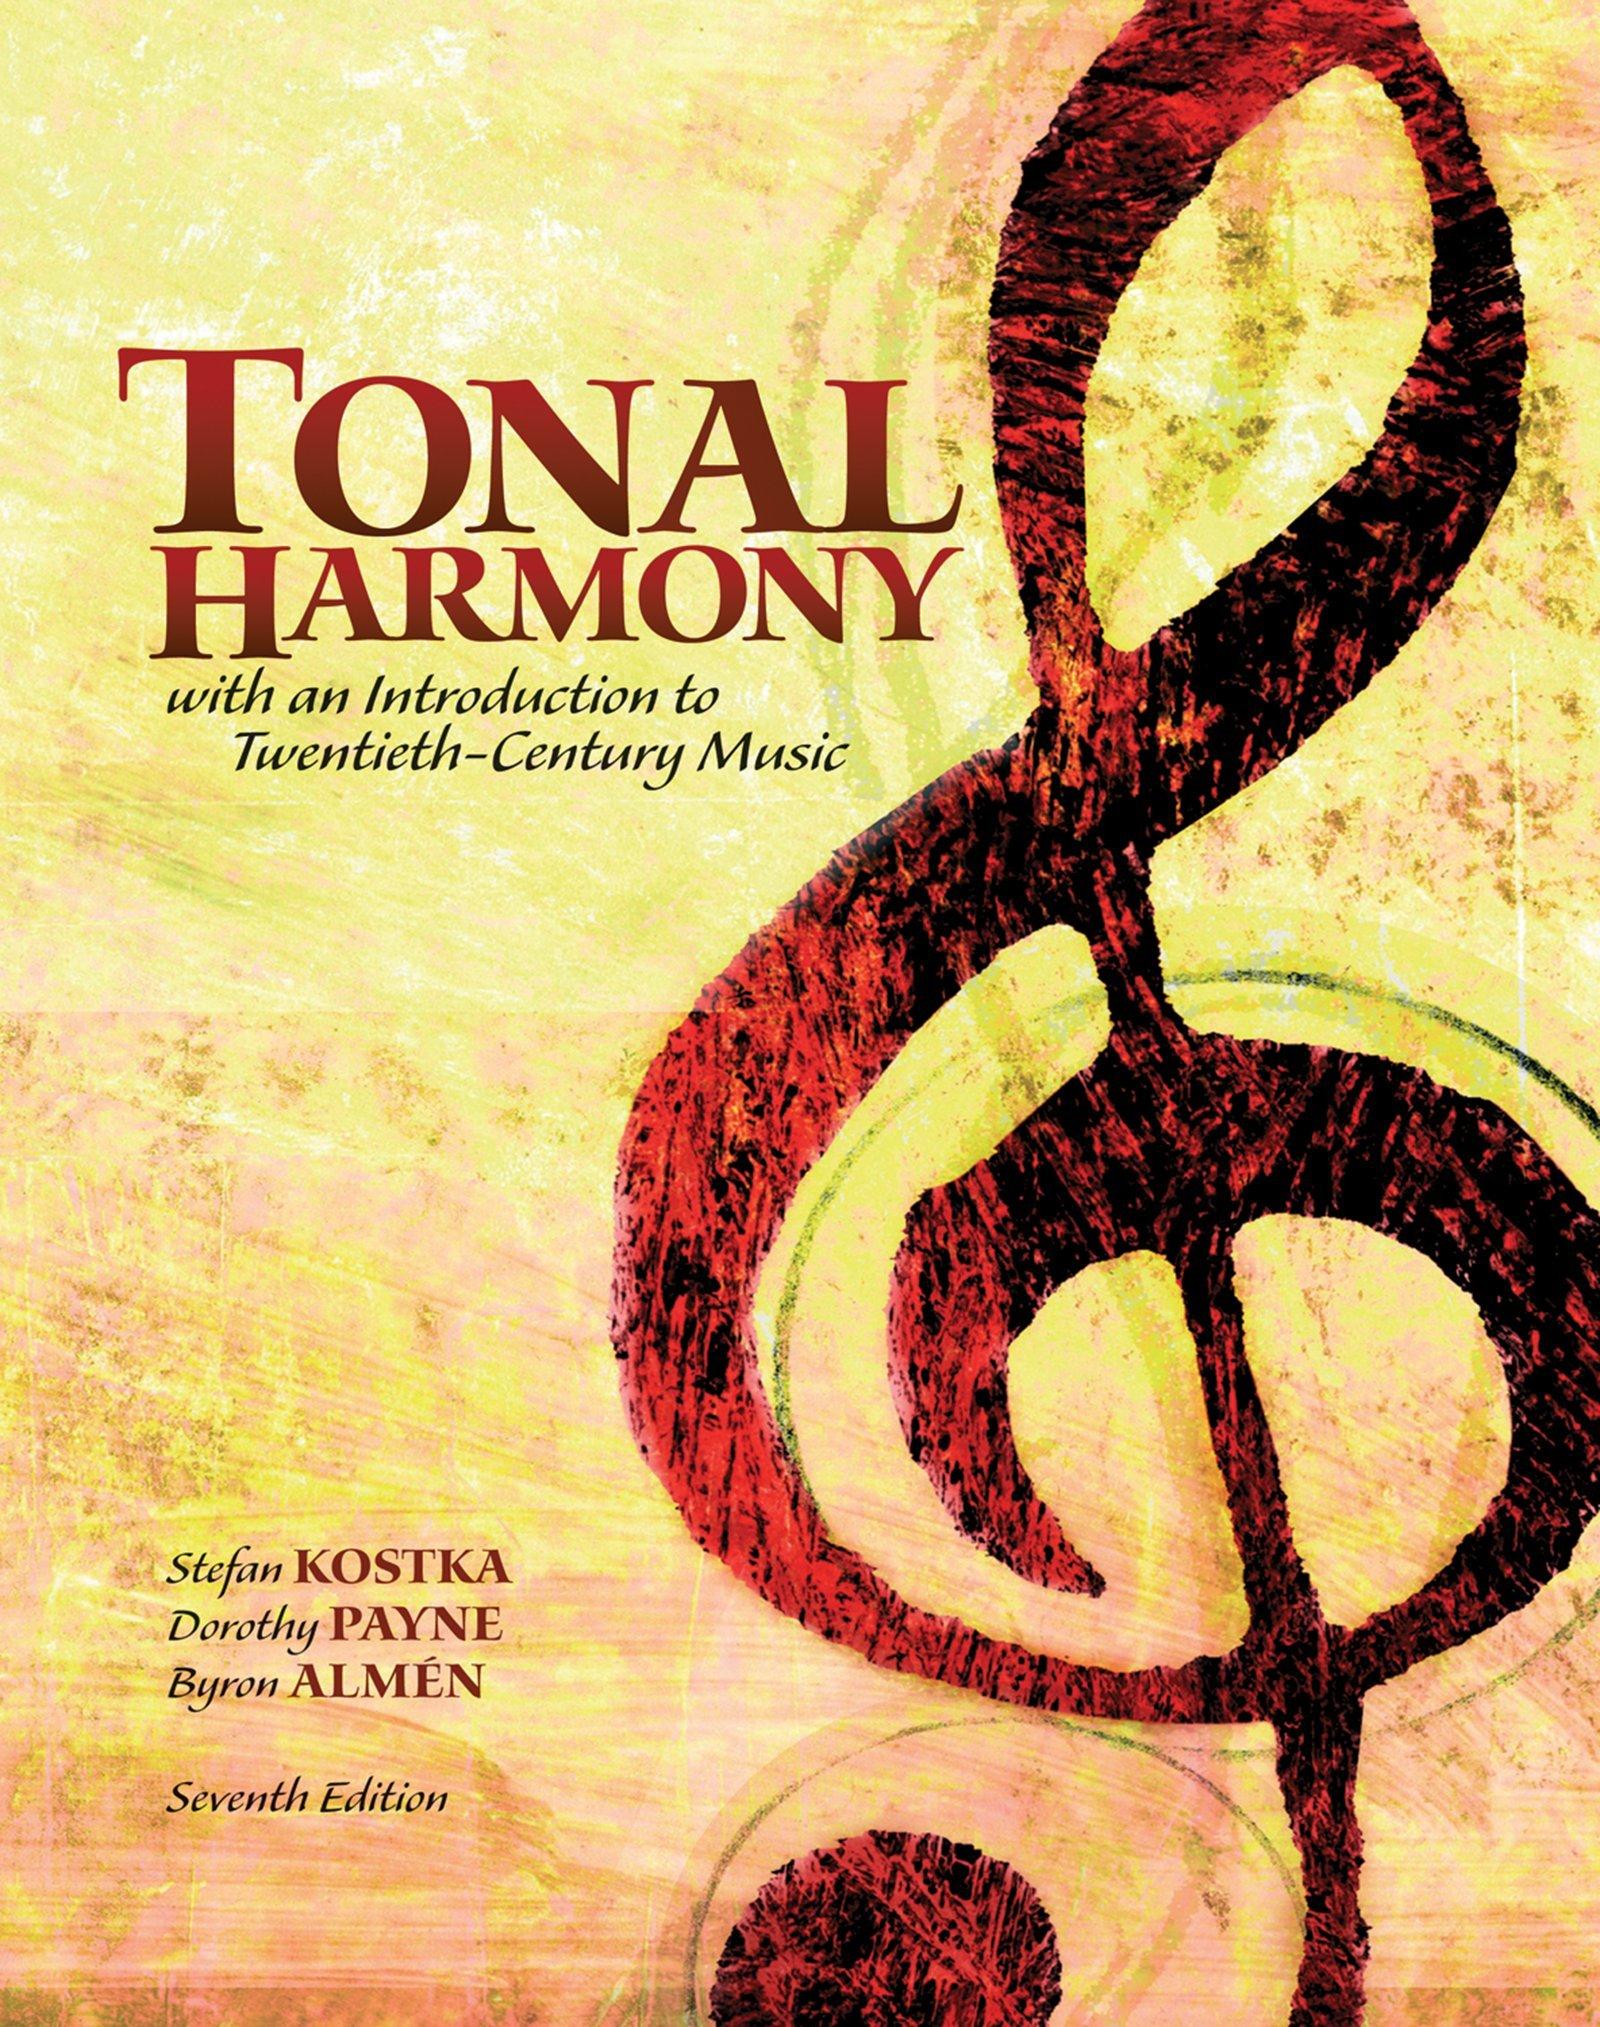 Audio CD for Tonal Harmony by Brand: Ingram